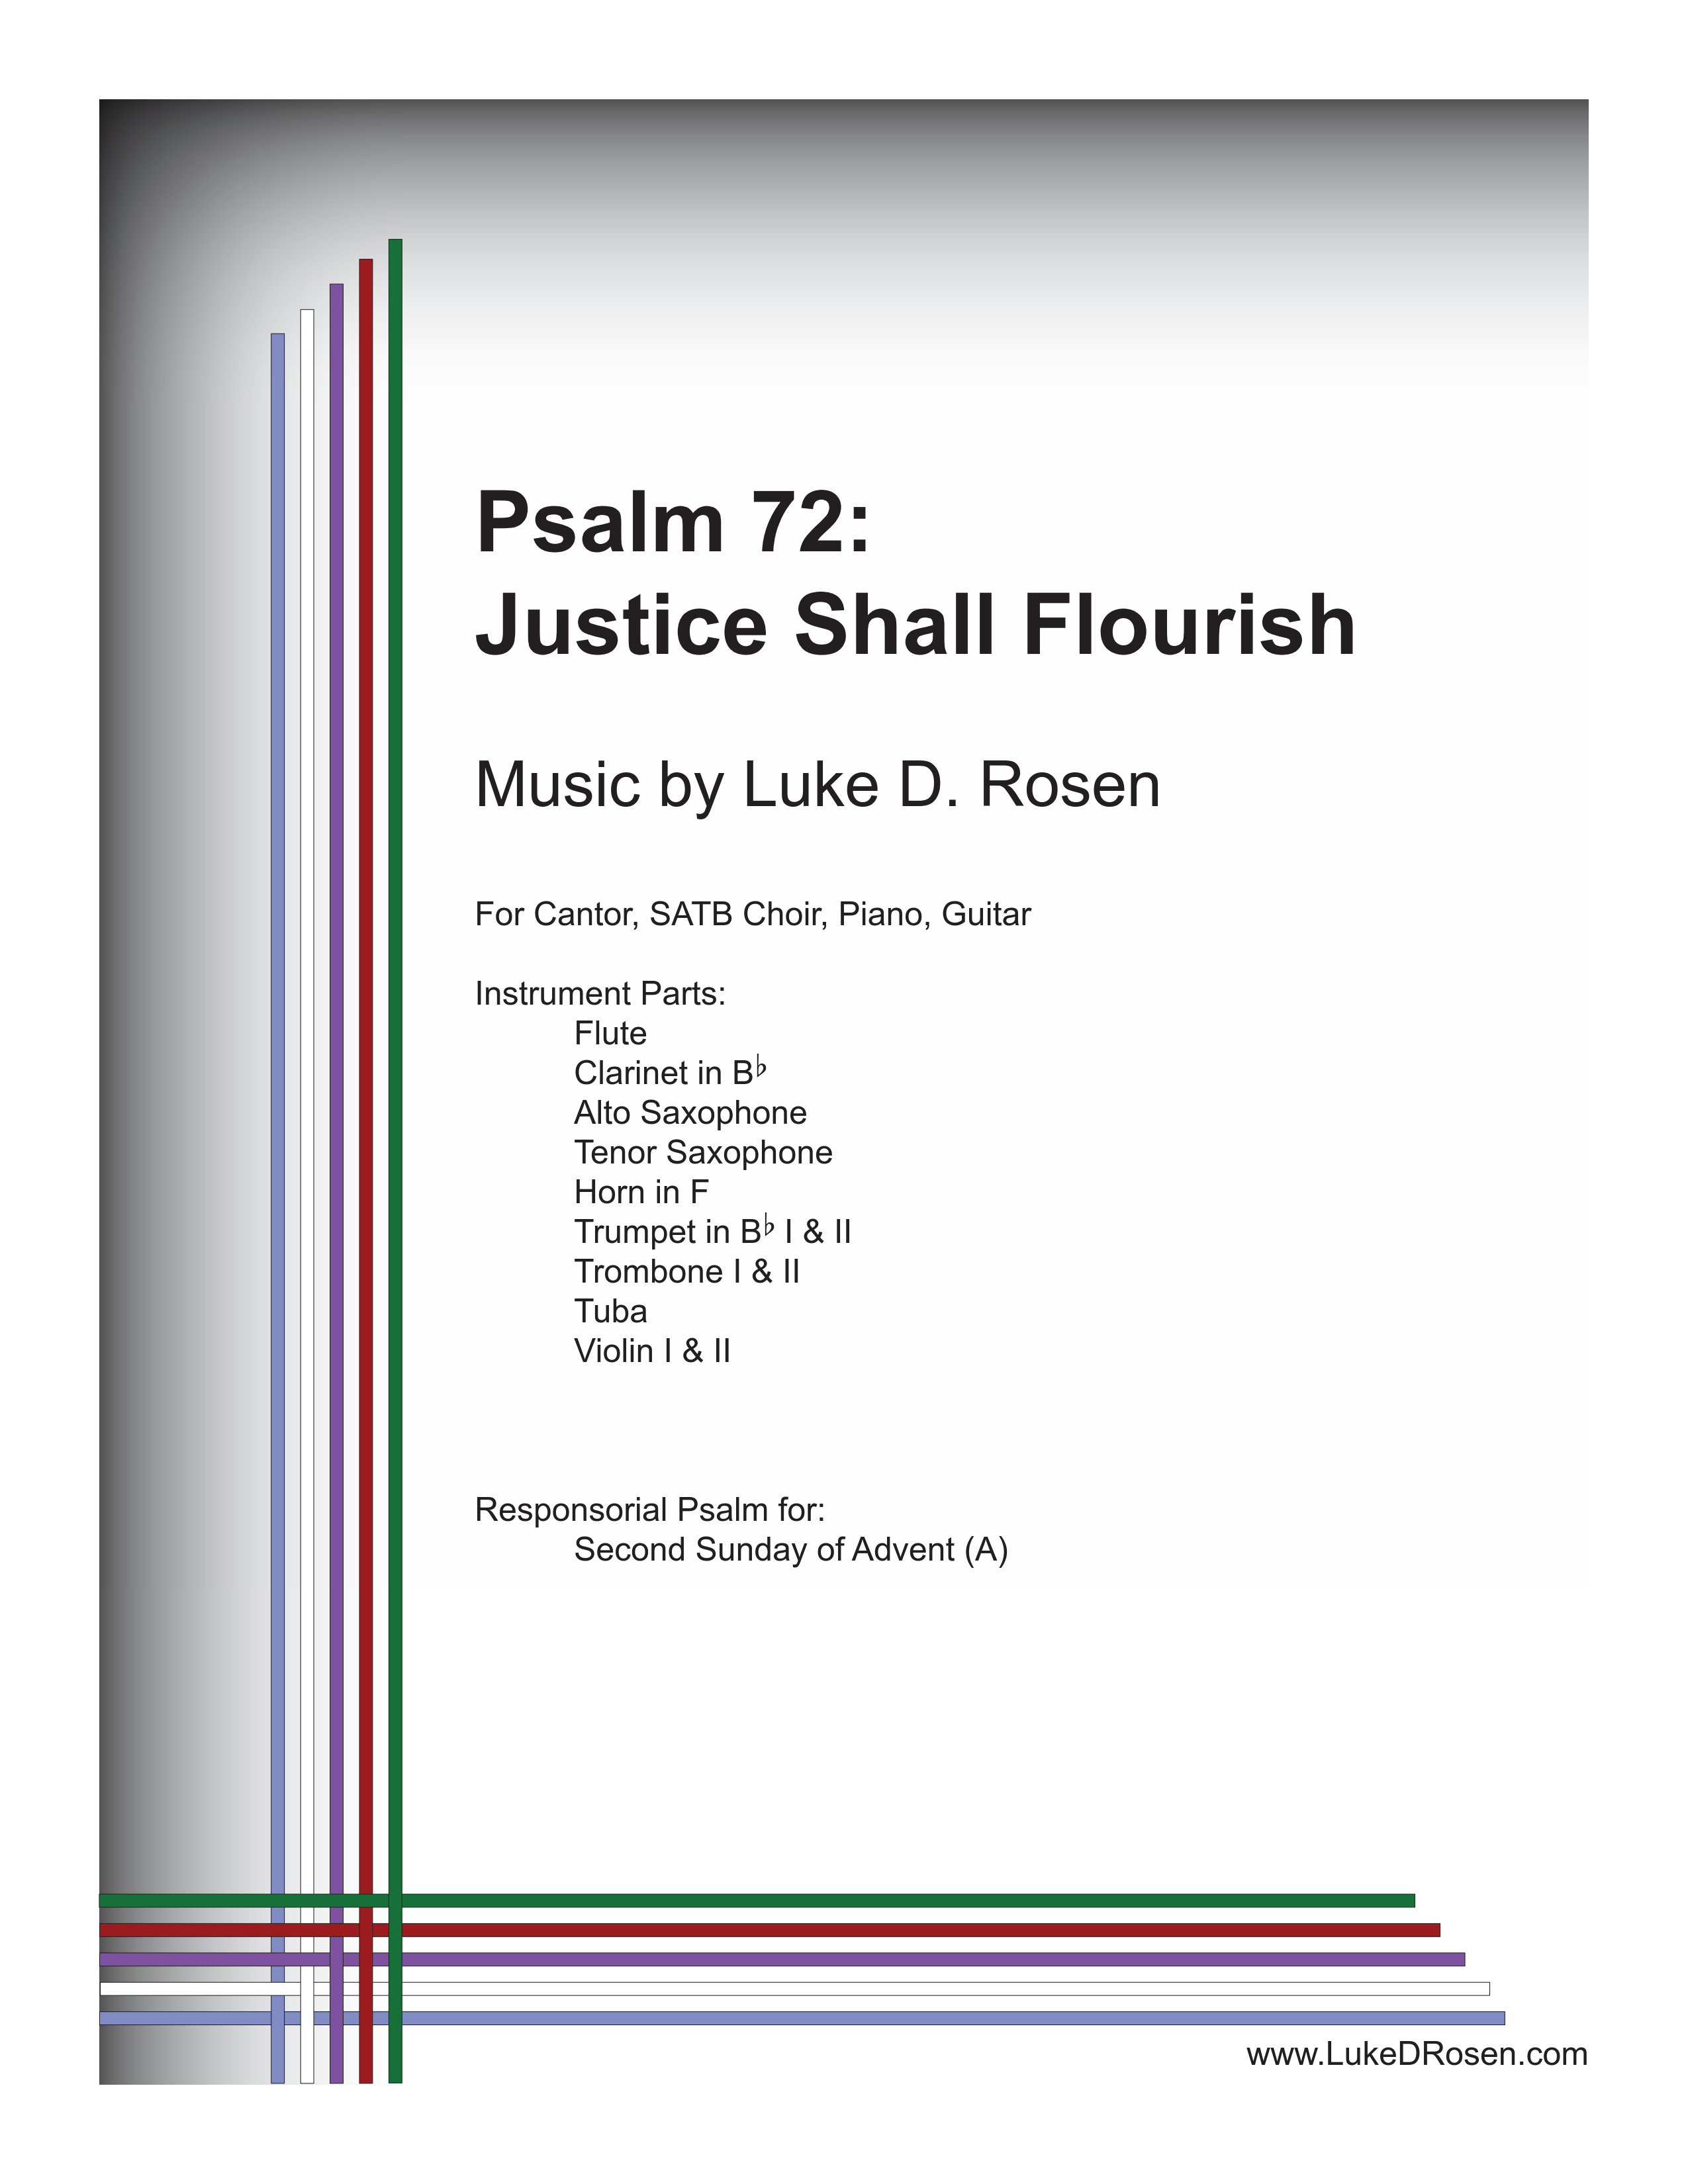 Psalm 72 Justice Shall Flourish Rosen Sample Complete PDF 1 png